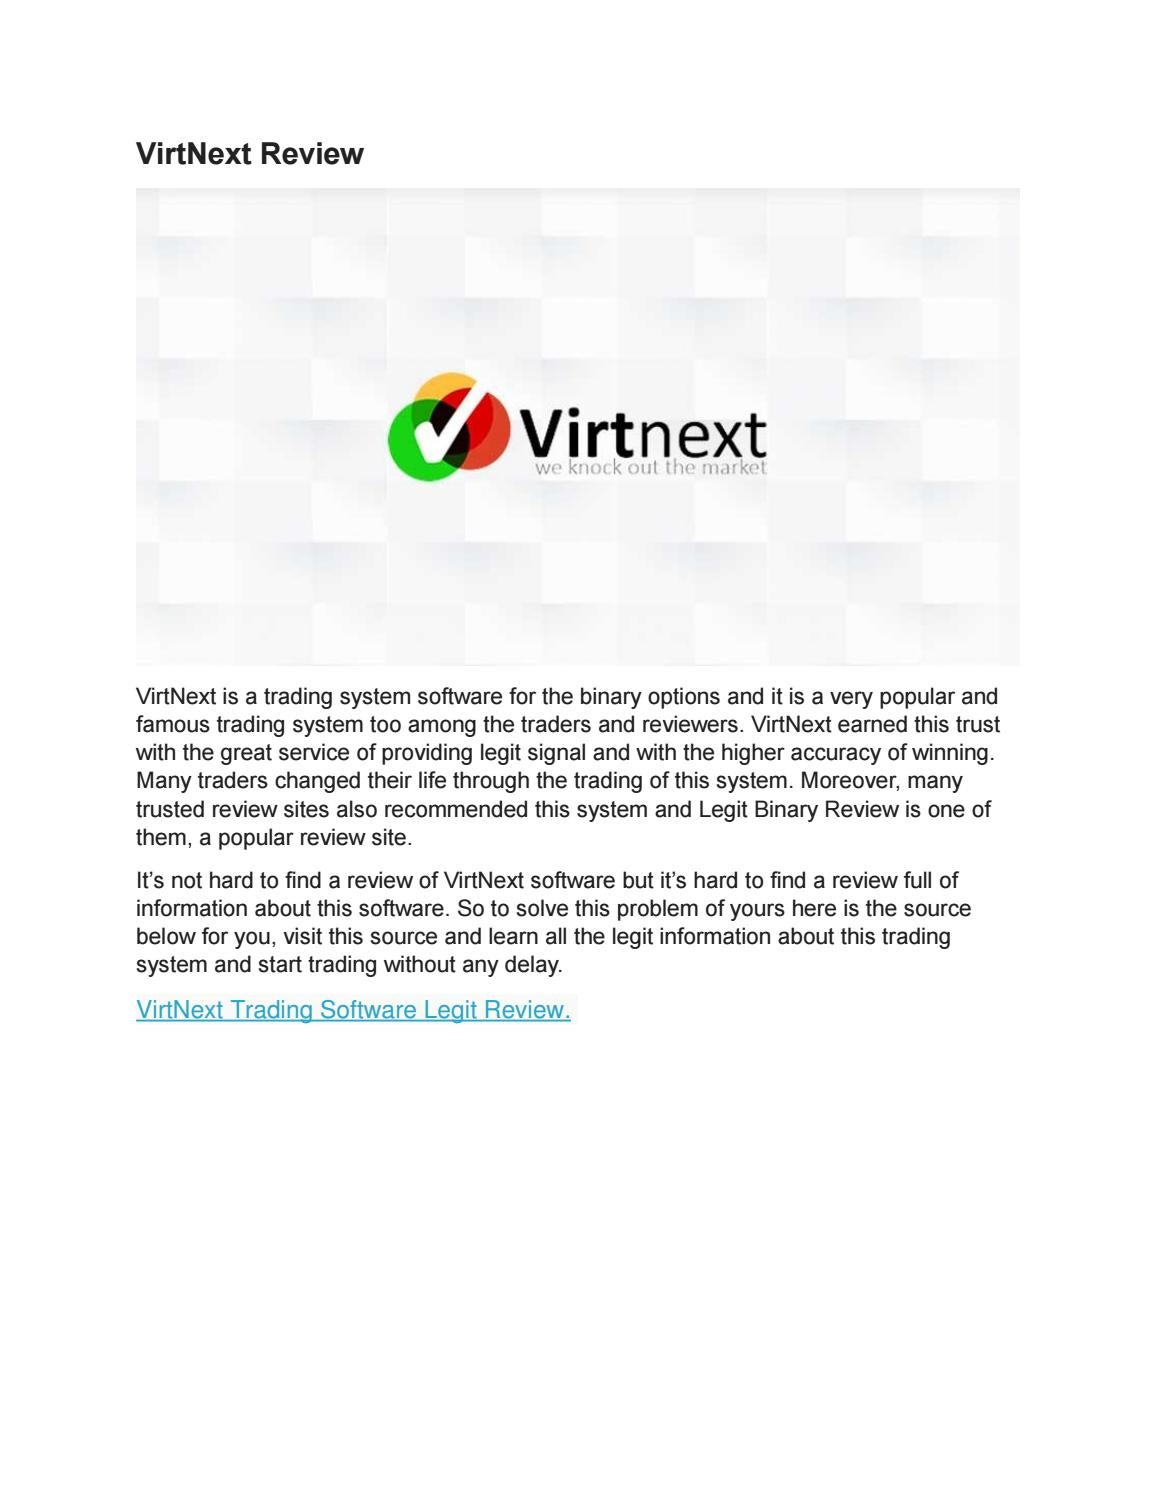 Virtnext binary options